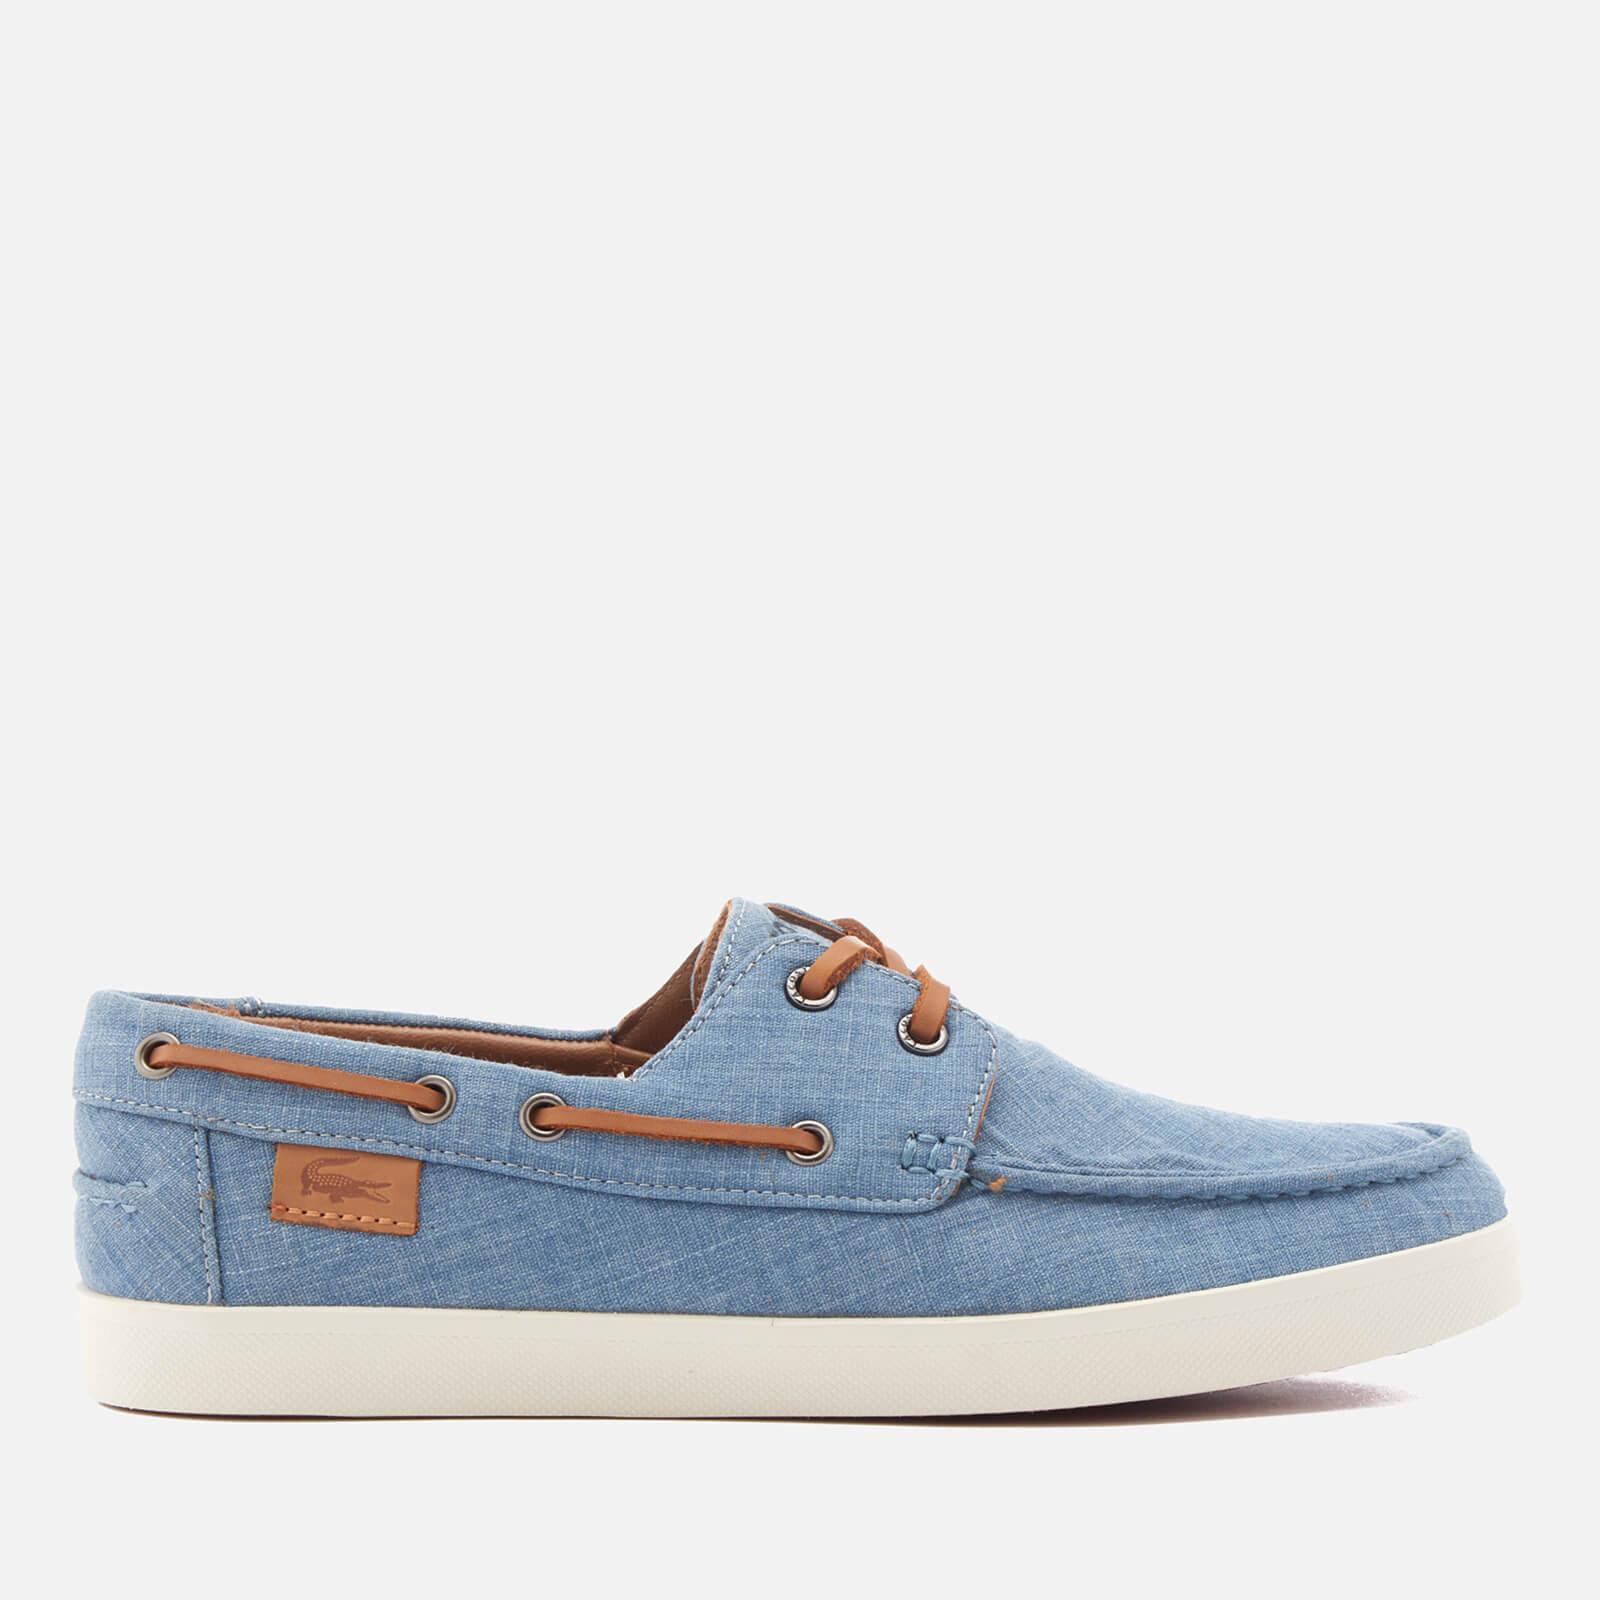 333d7092a81f Lacoste Men s Keellson Boat Shoes - Blue Clothing